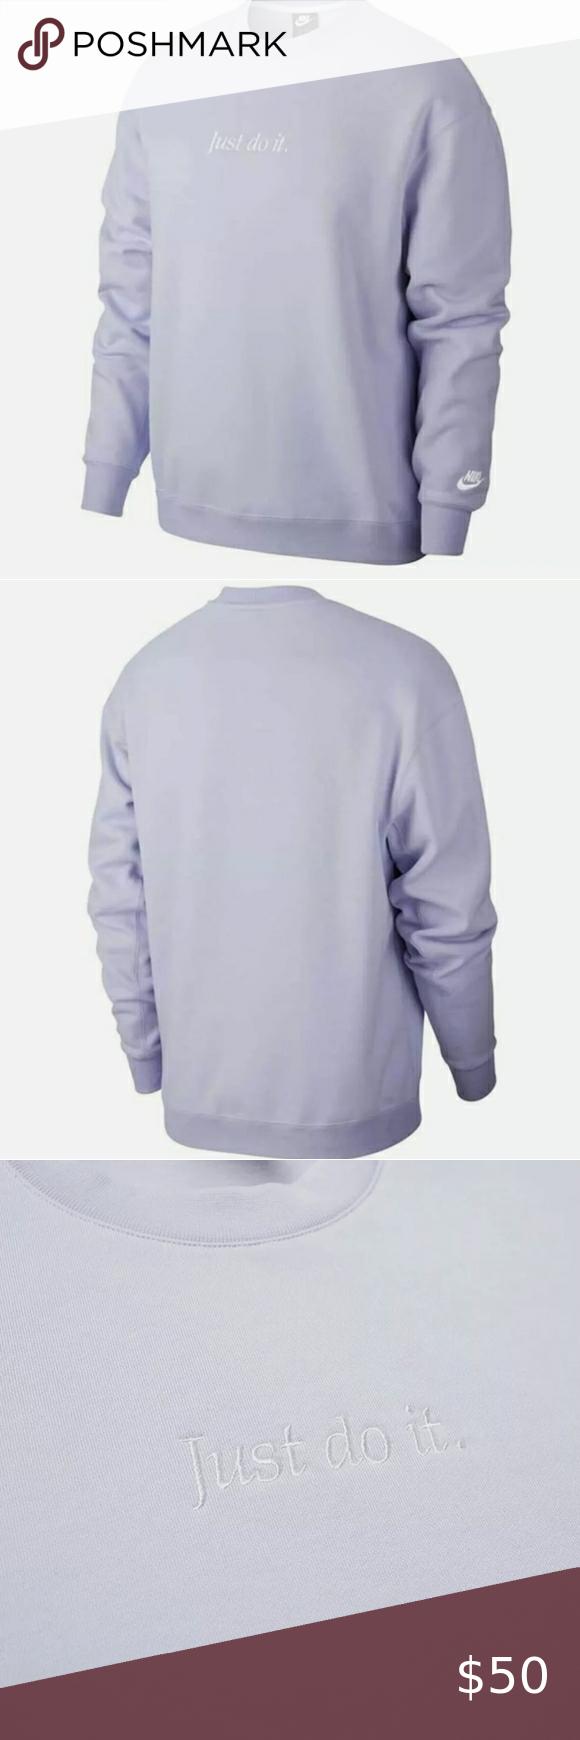 Nike Sportswear Jdi Heavy Weight Crew Cd0414 539 Nike Sportswear Sportswear Sweatshirt Shirt [ 1740 x 580 Pixel ]